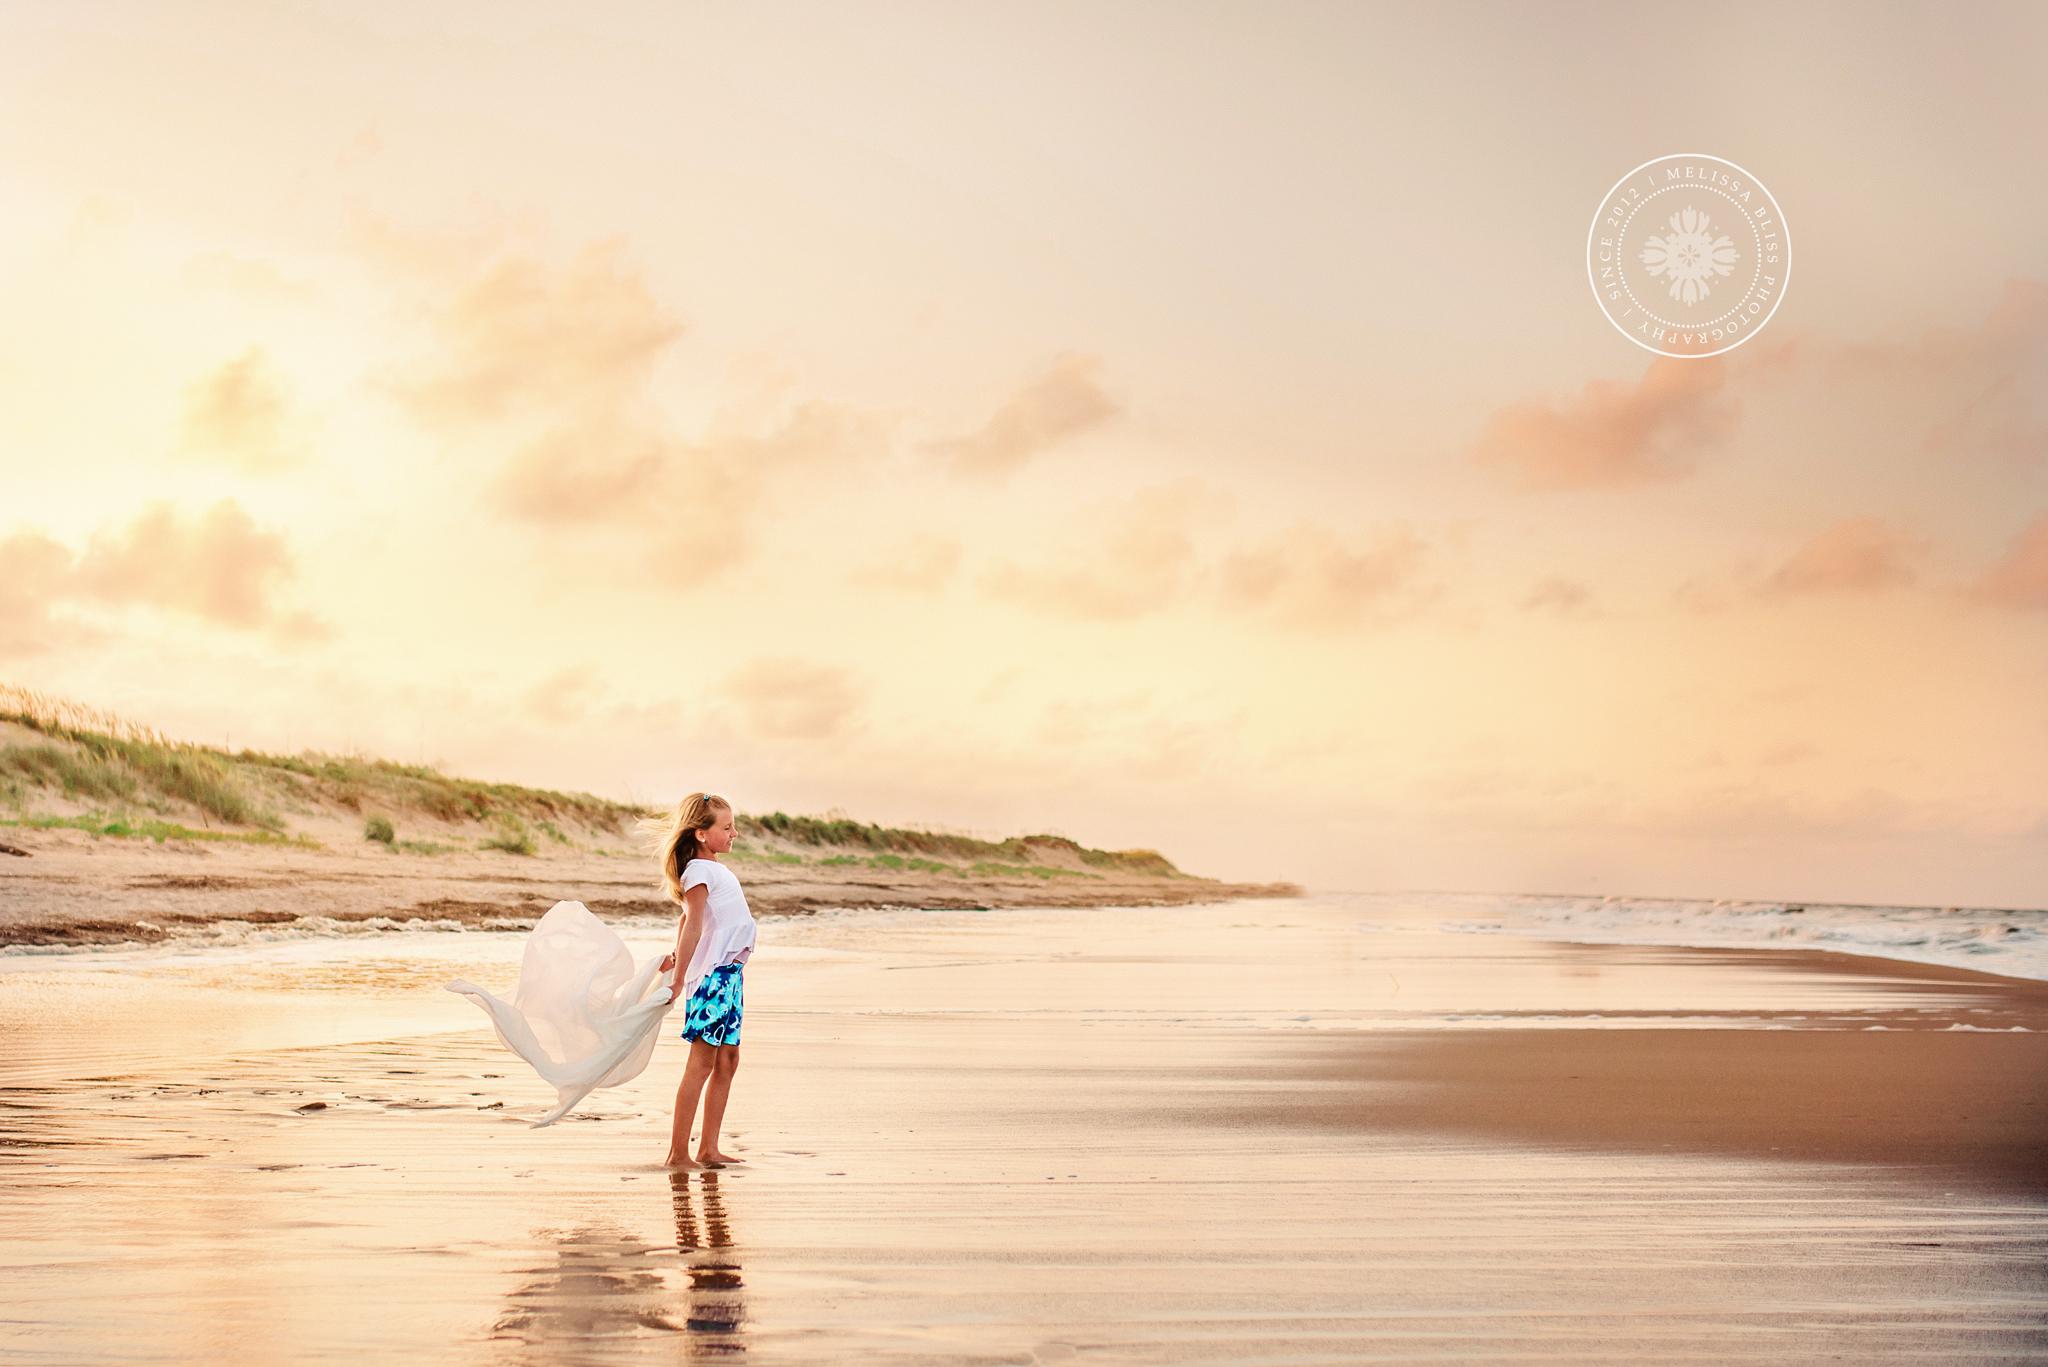 virginia-beach-child-photographers-hampton-roads-family-photographer-melissa-bliss-photography-sunset-beach-photo-session-va-beach